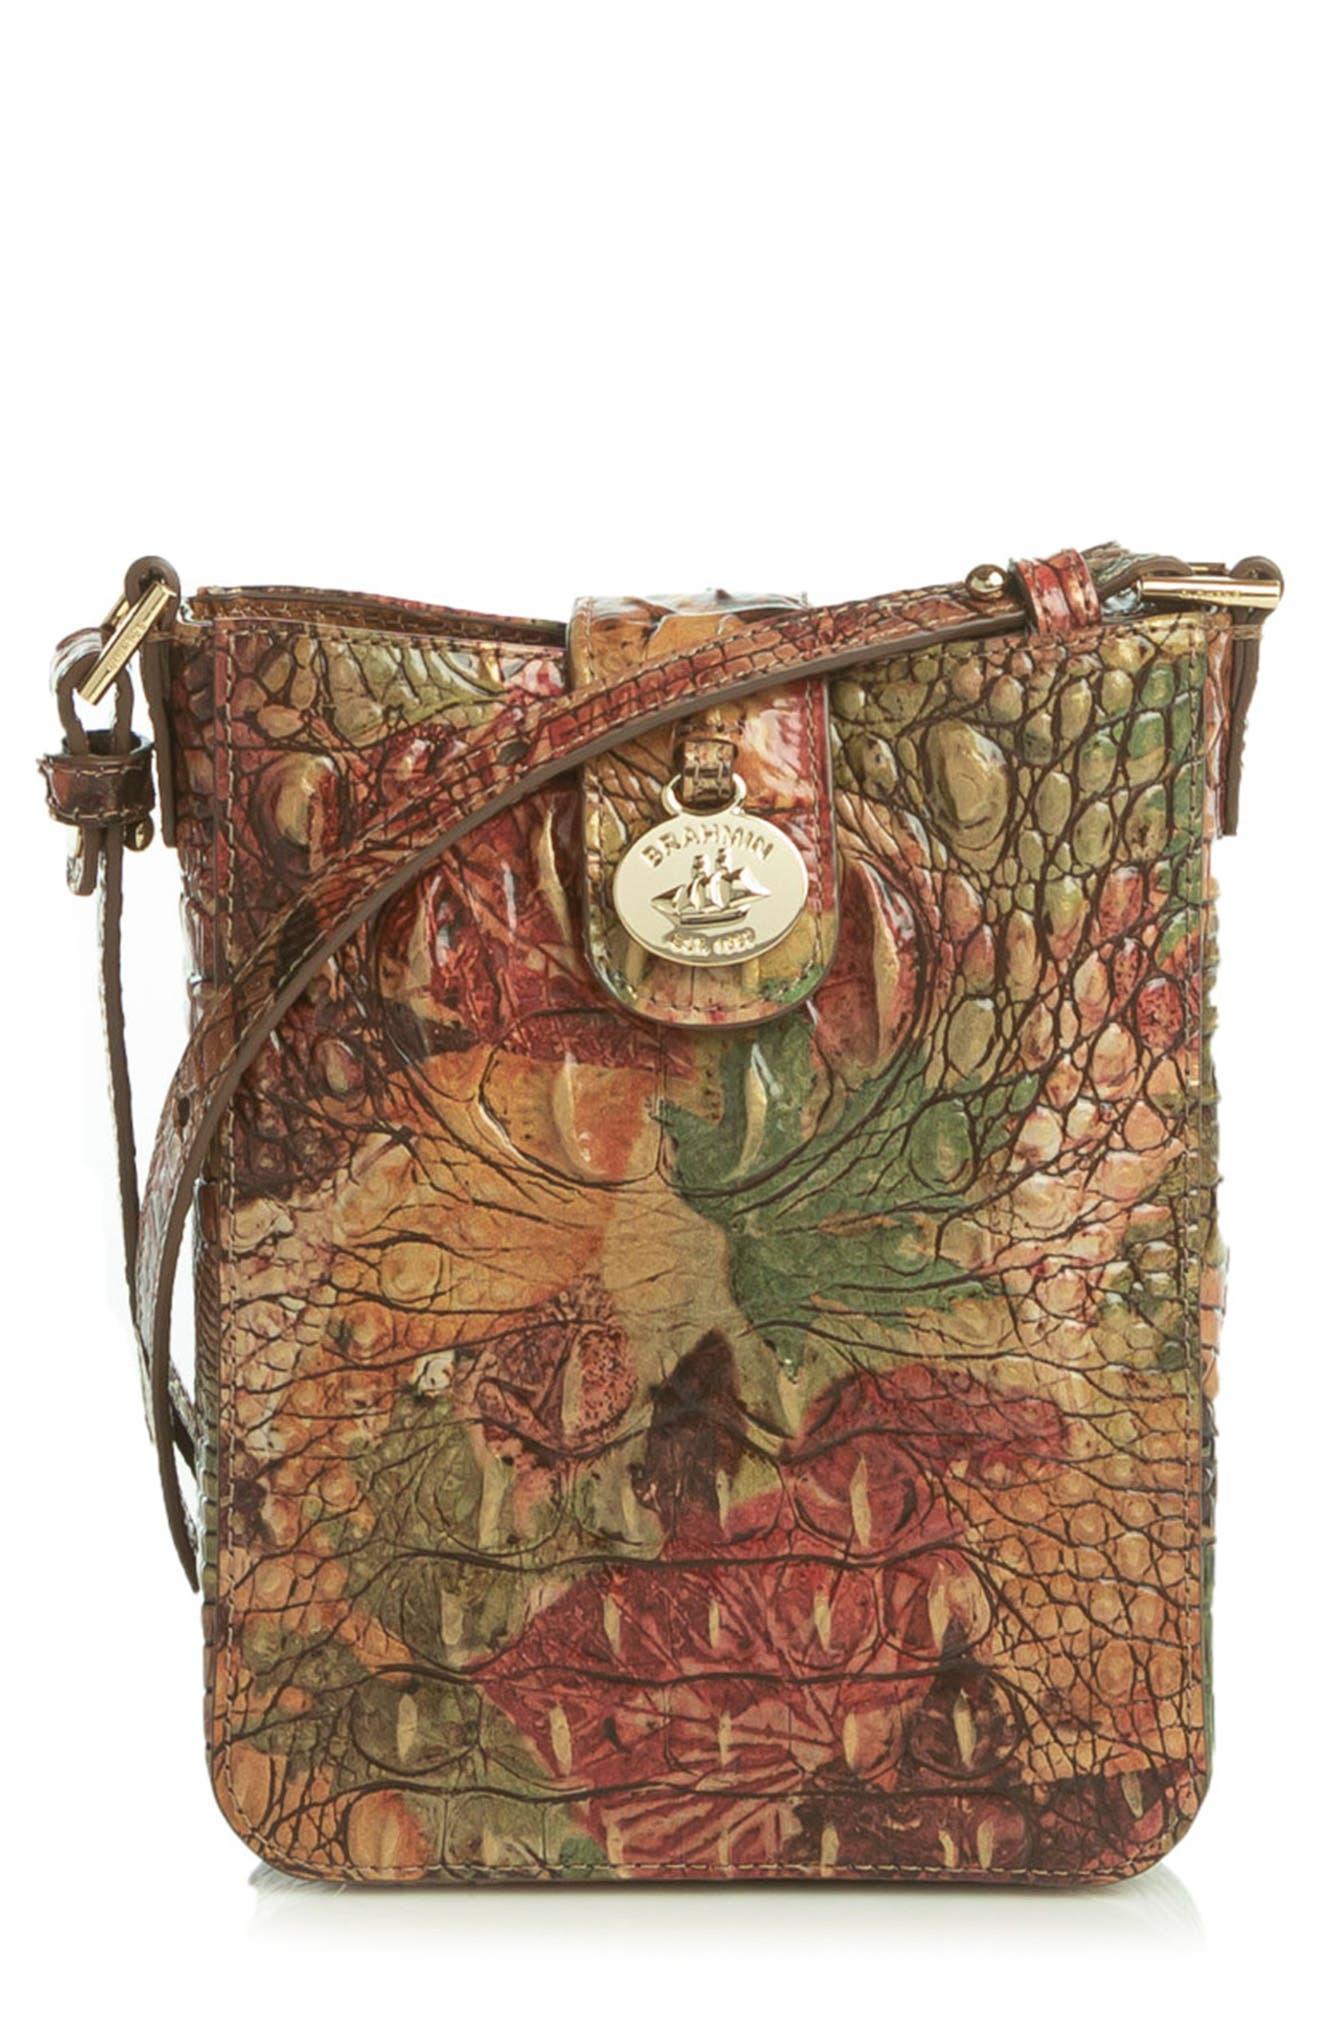 Marley Croc Embossed Leather Crossbody Bag